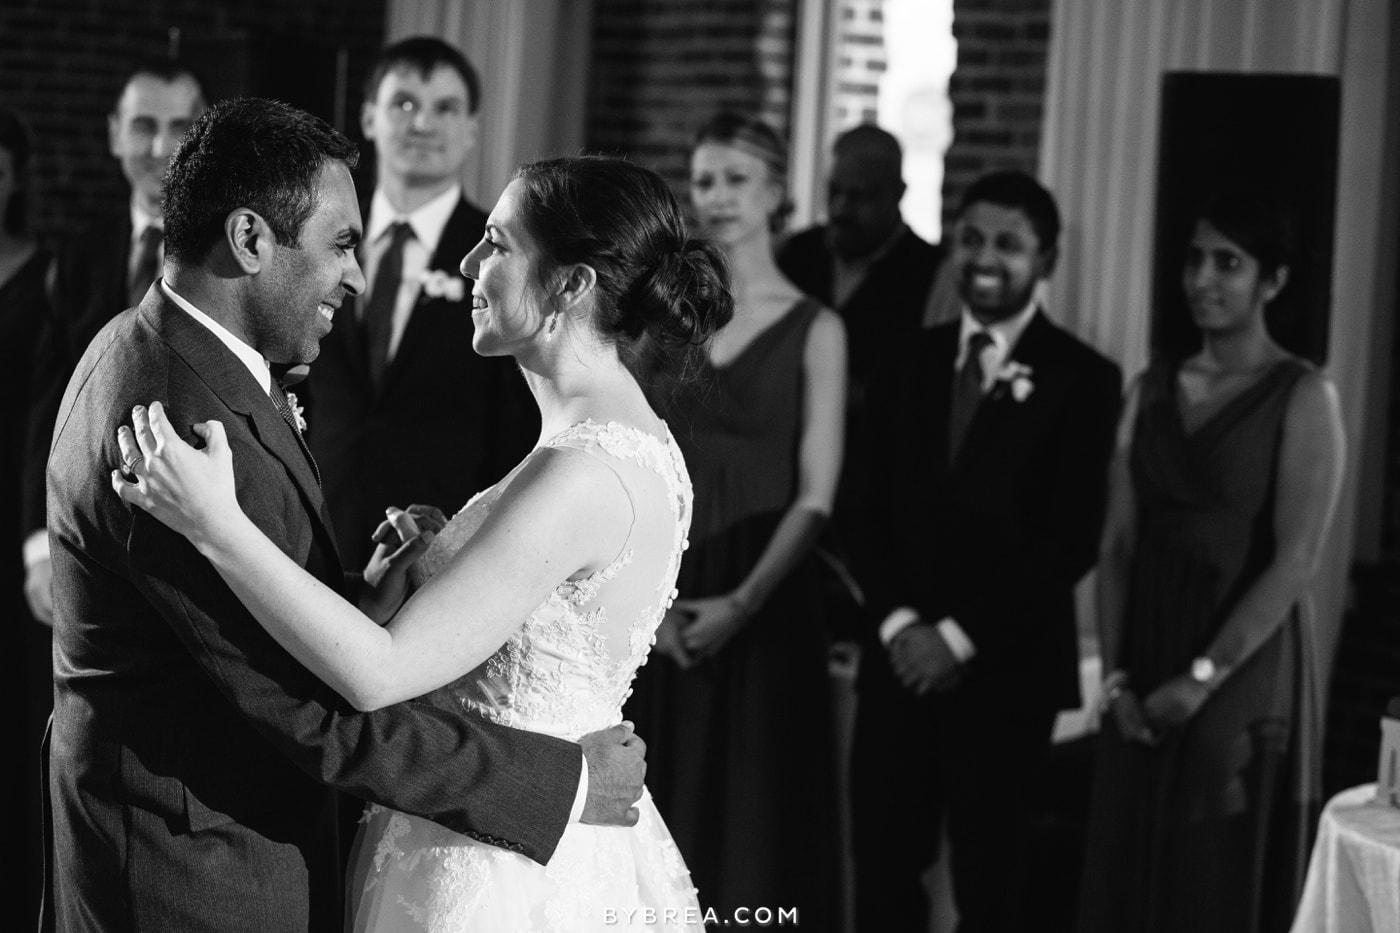 tracy-bharath-frederick-douglass-baltimore-wedding-photos_0299